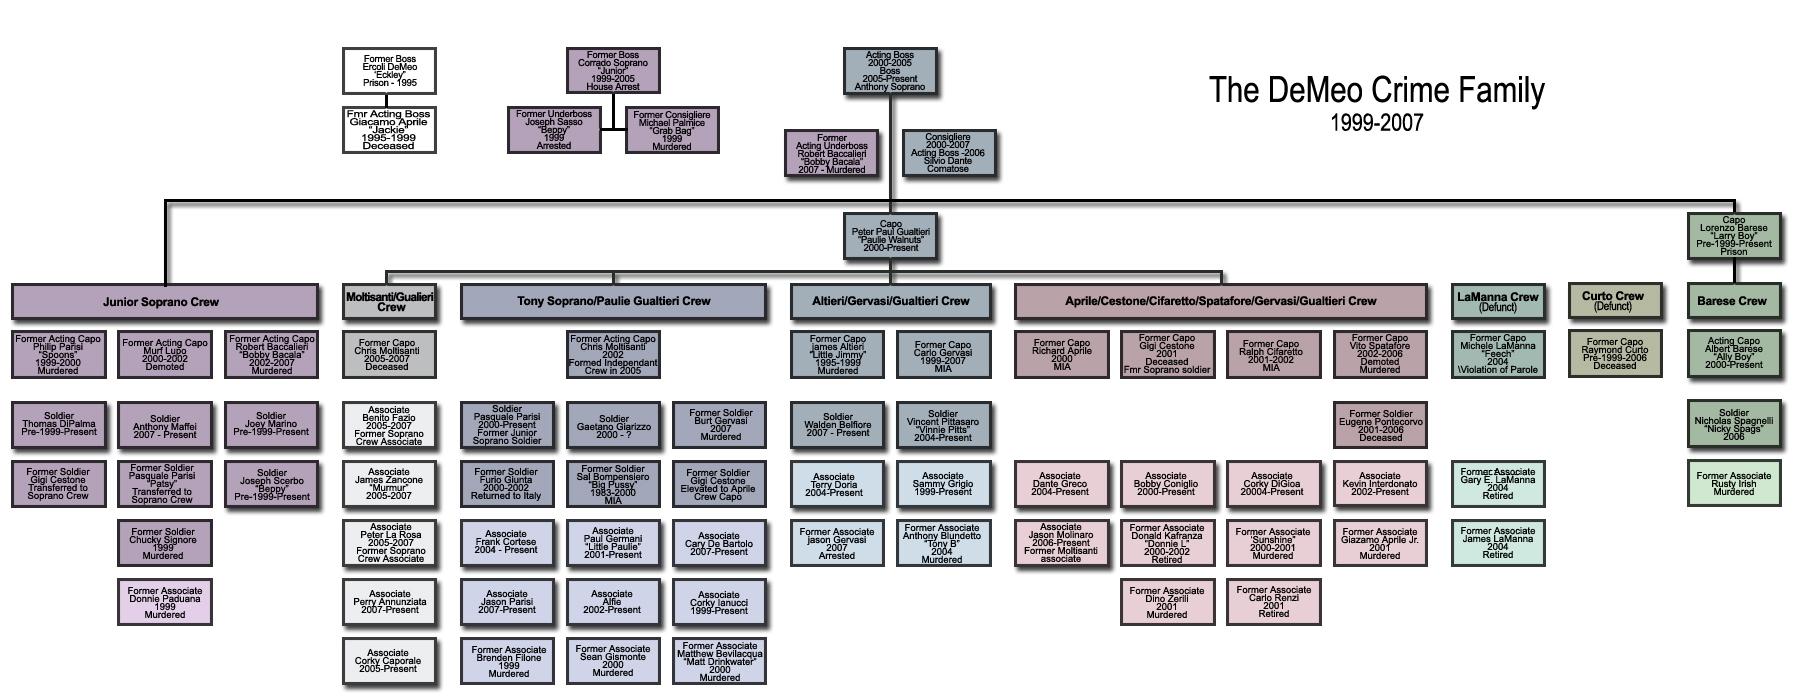 B tree wikipedia the free encyclopedia autos post for The free wikipedia